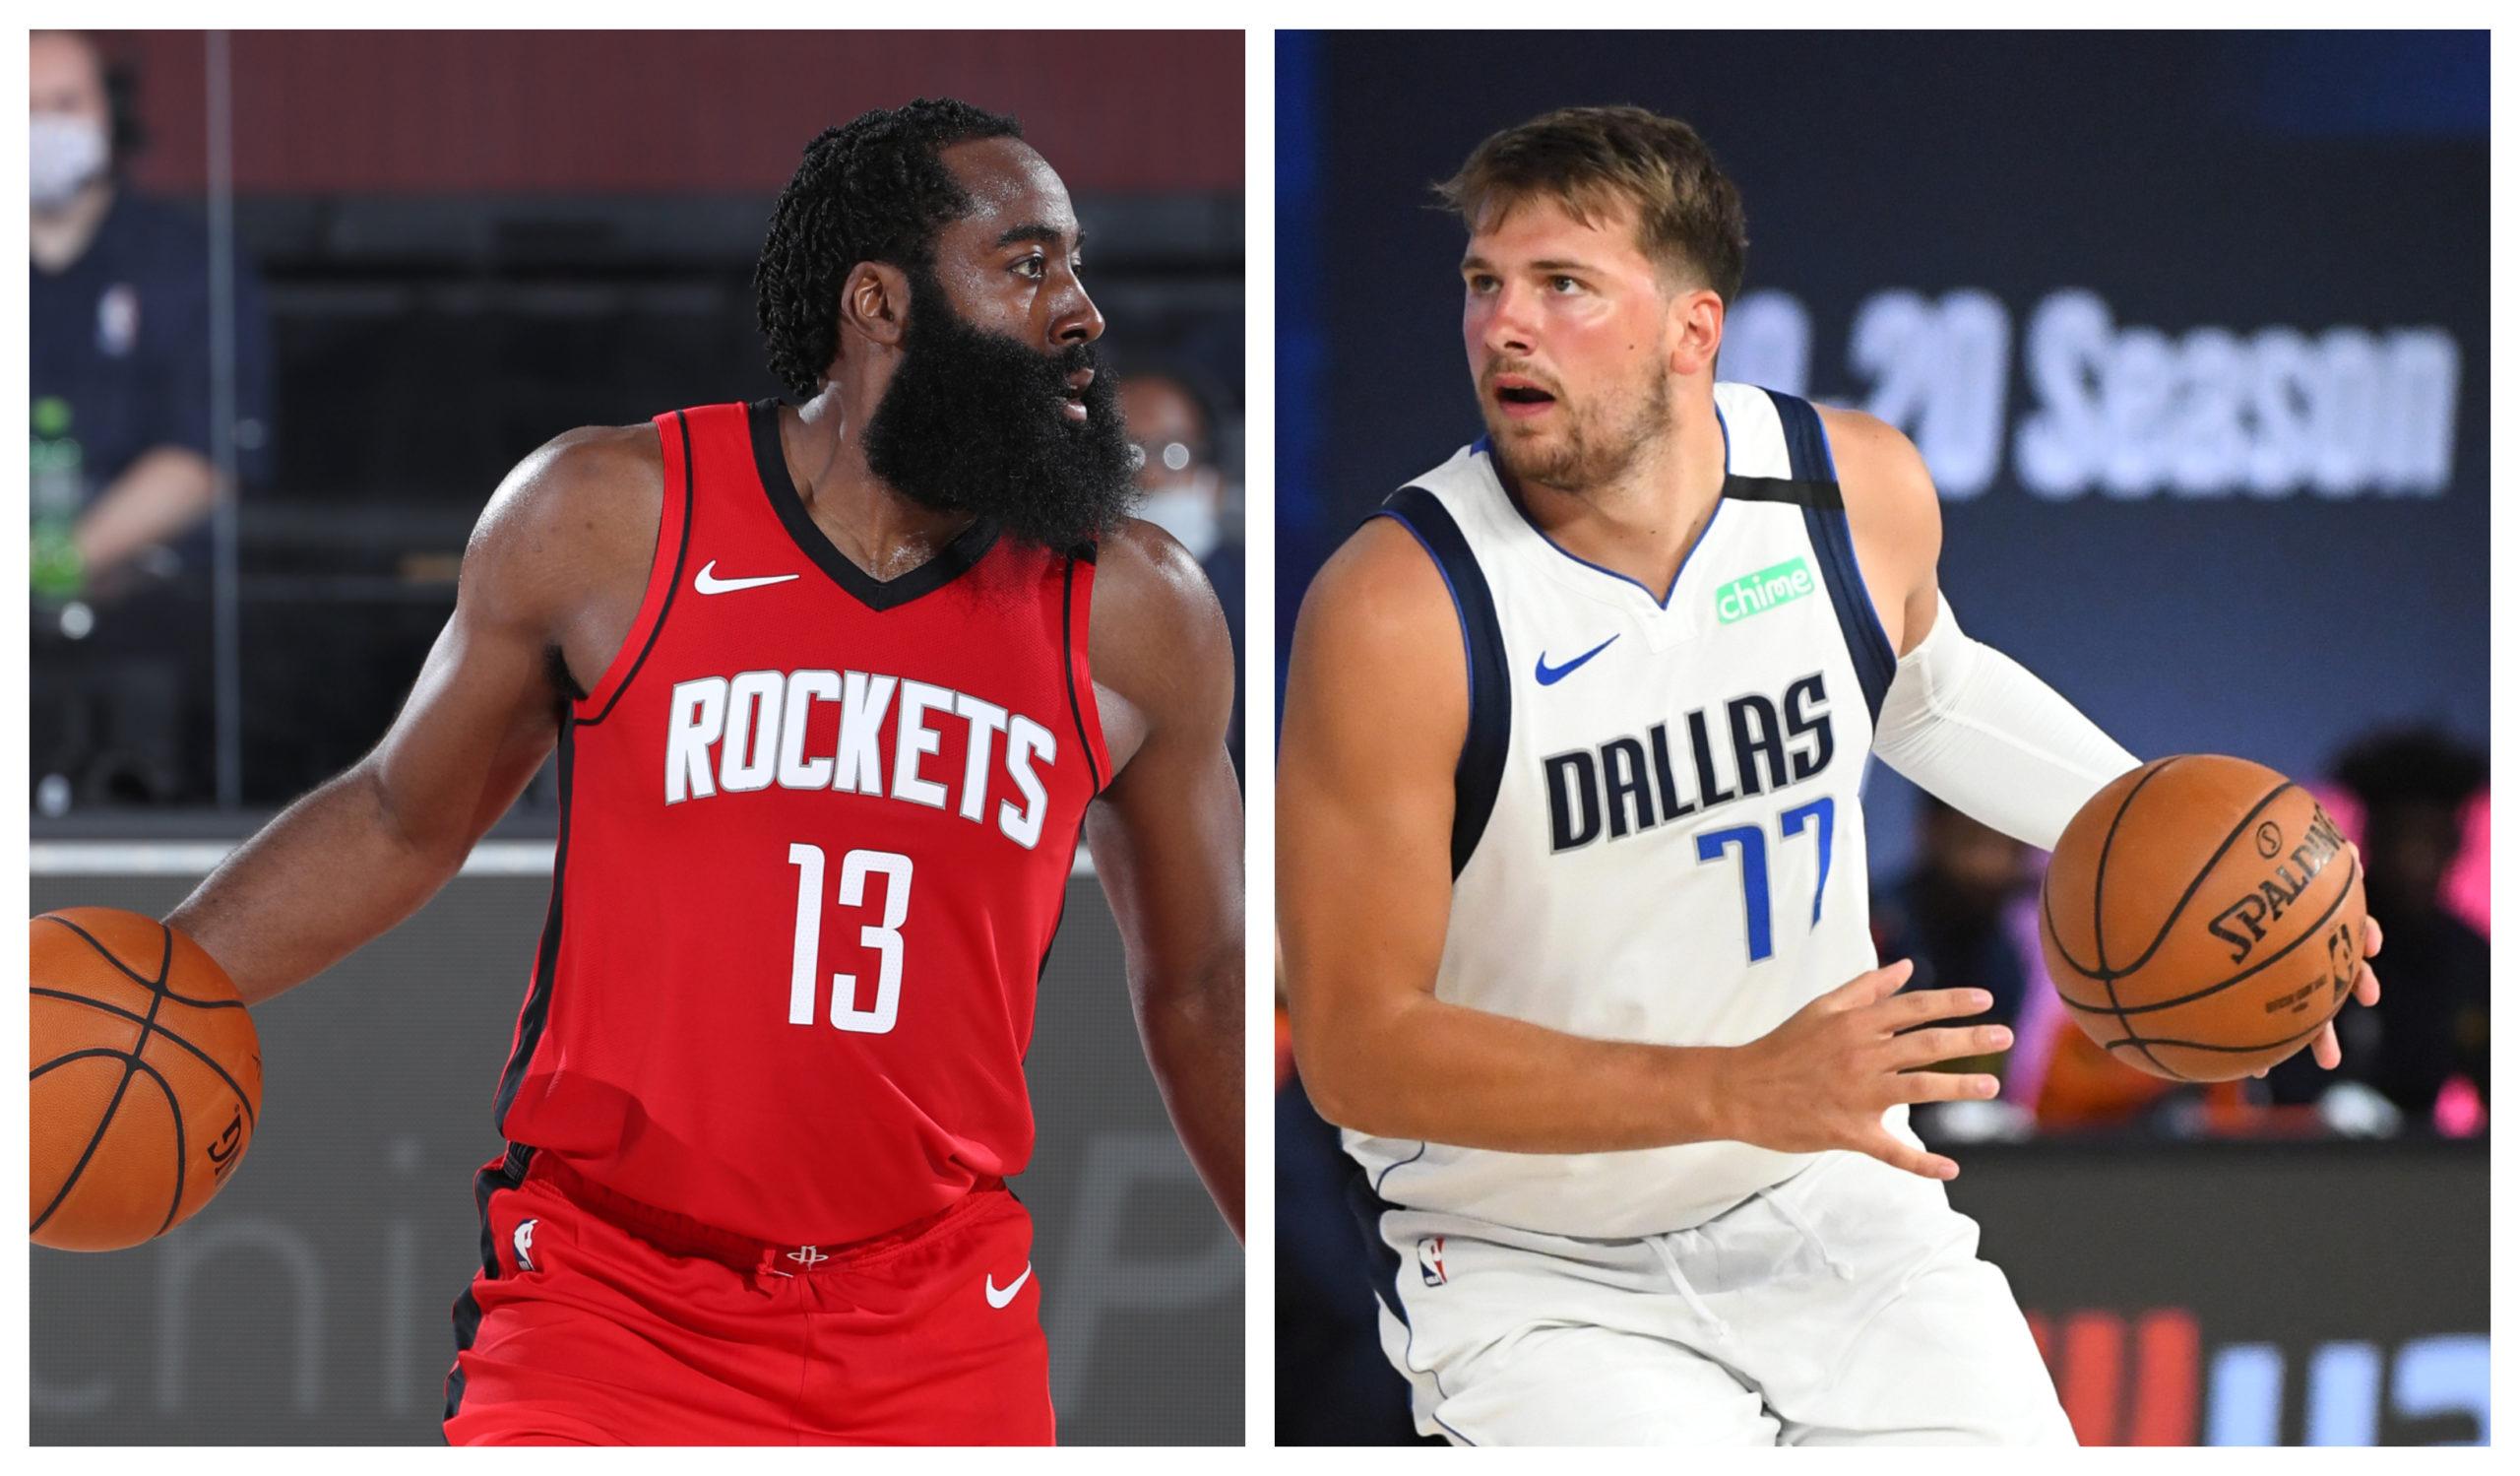 Friday Nba Odds Picks And Predictions How To Bet Rockets Vs Mavericks July 31